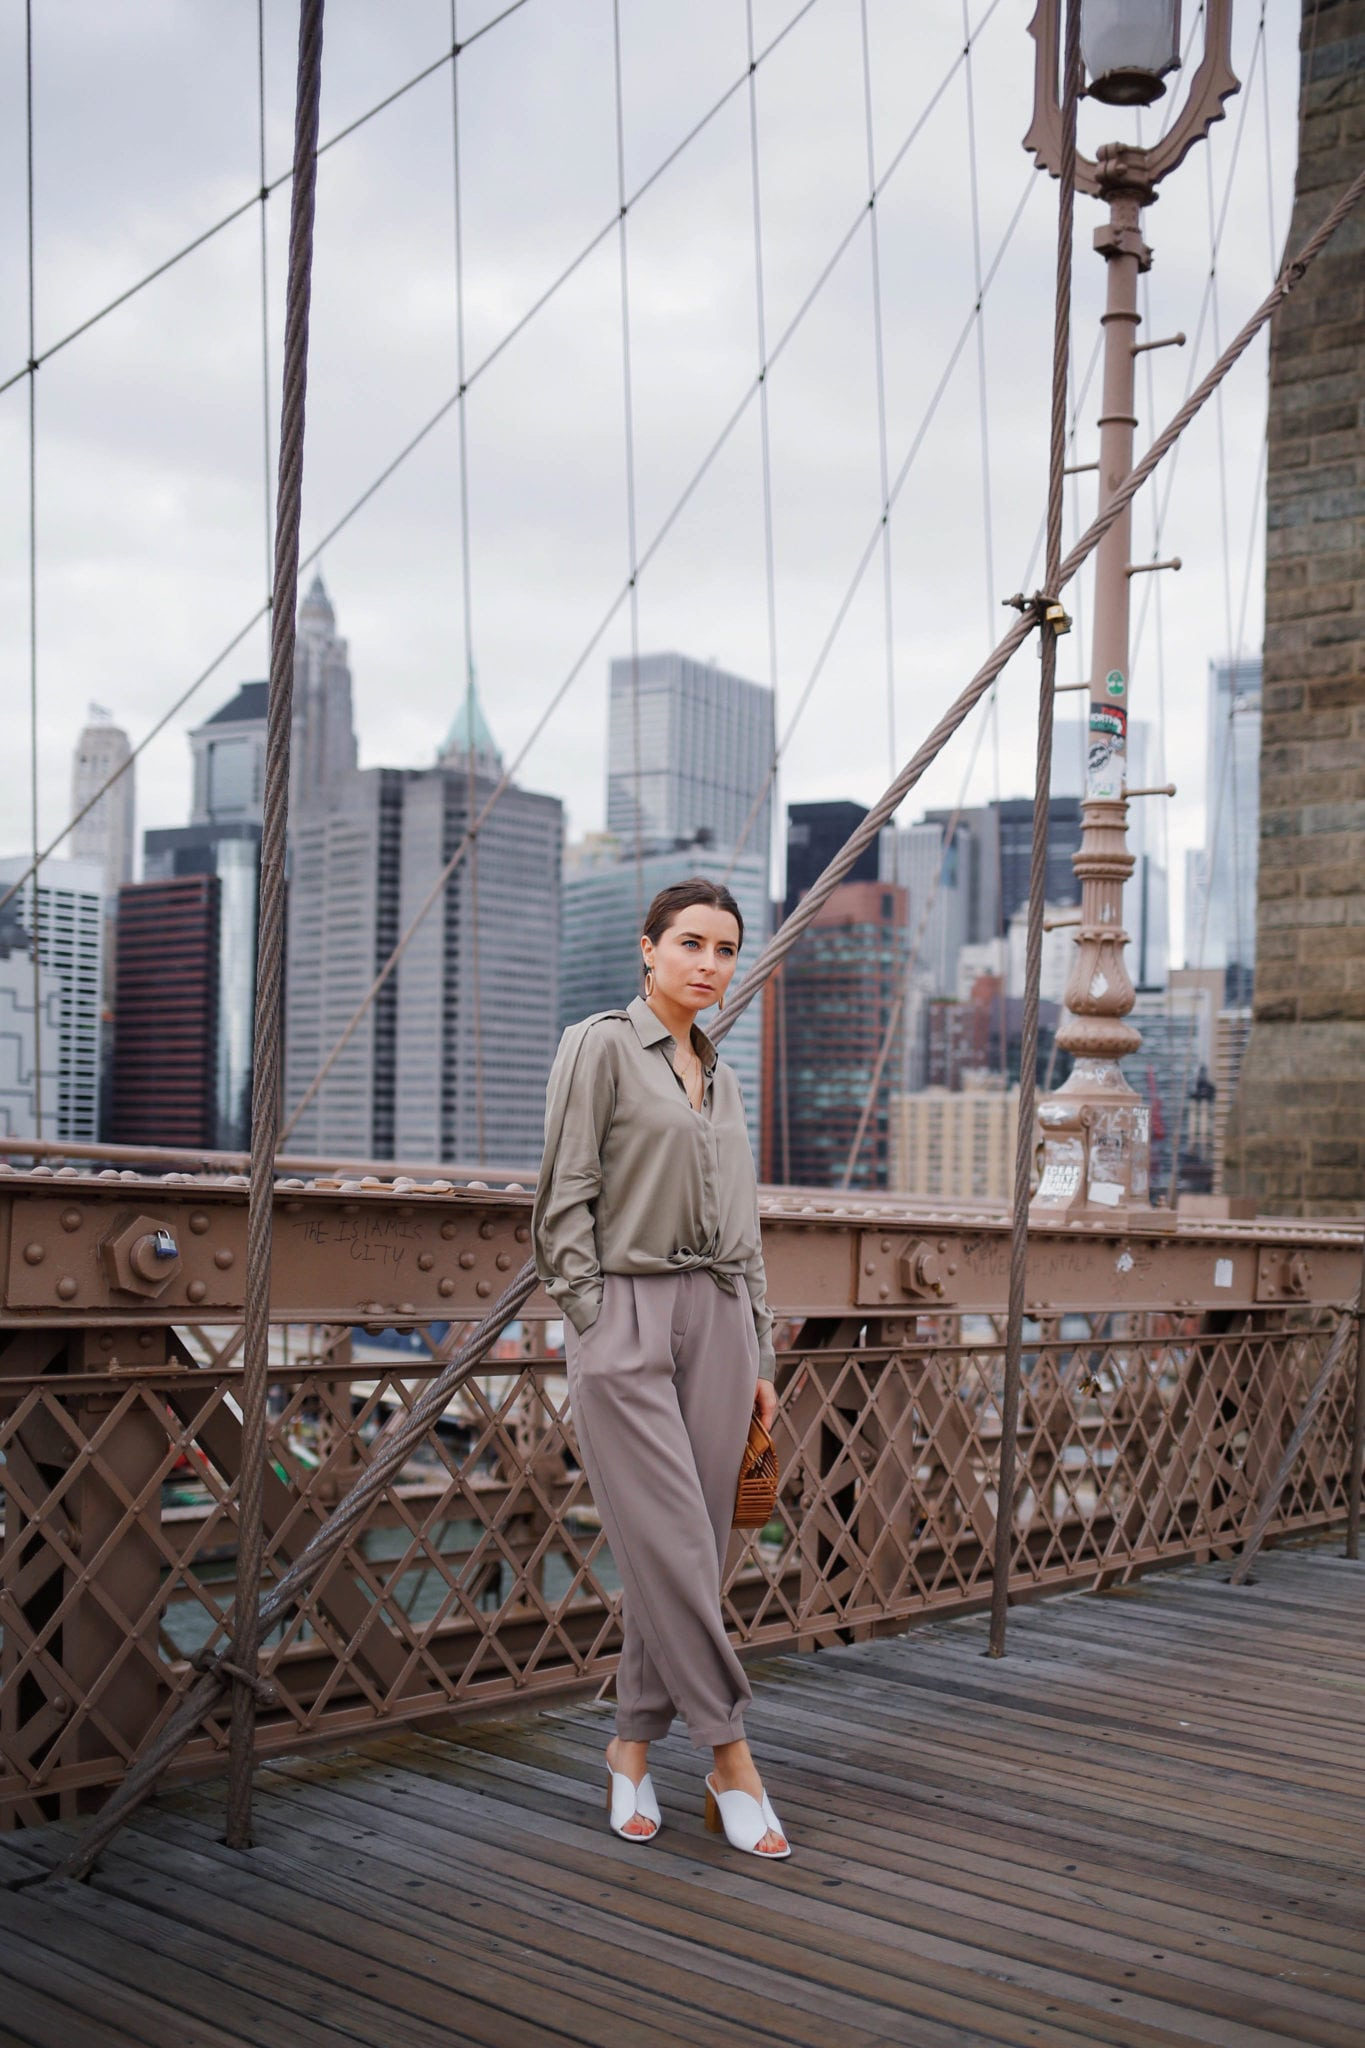 Bogdar Army Effortless Chic Outfit - Shot in New York - Brooklyn Bridge - Featuring Fashion Blogger Julia Comil